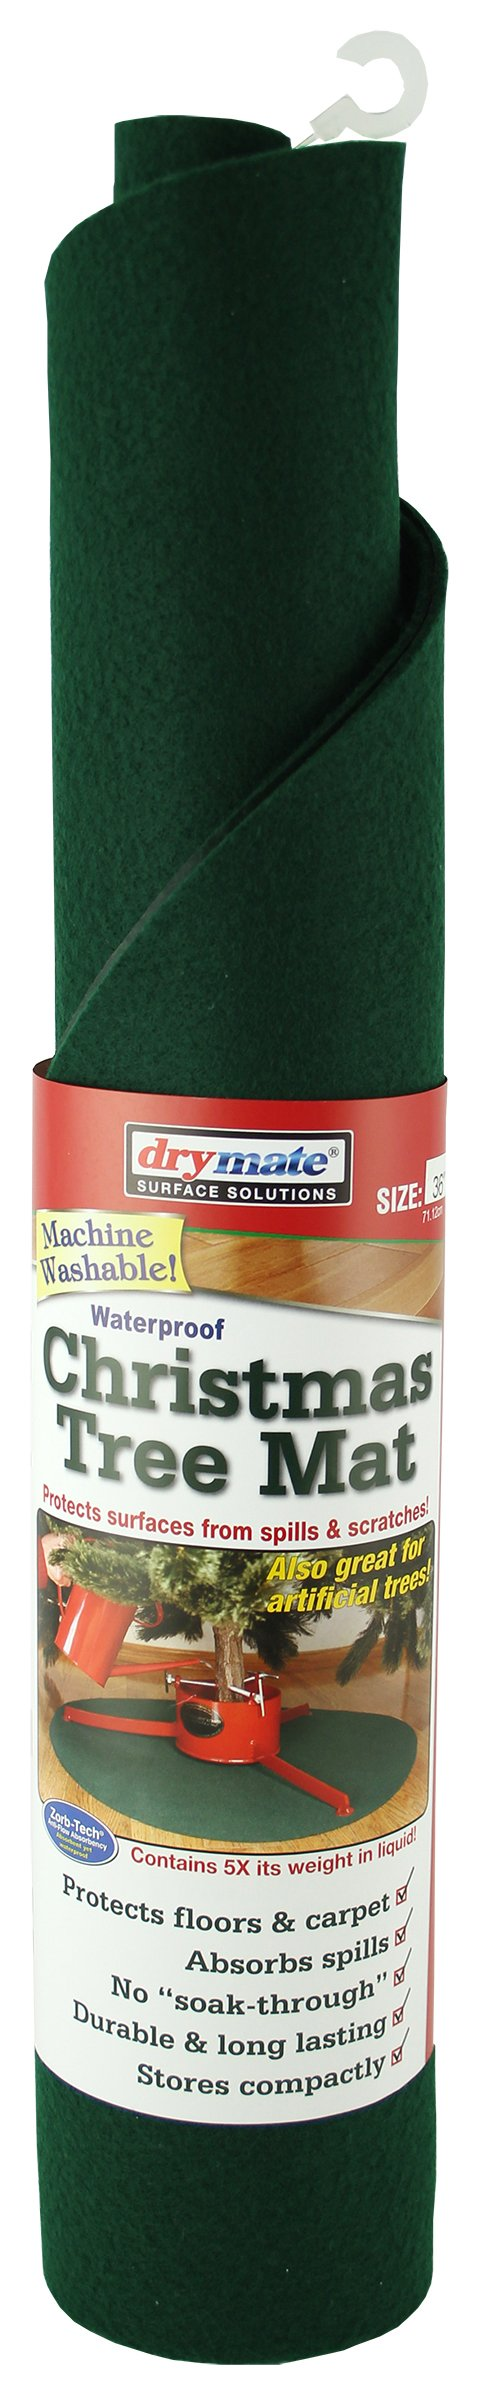 Drymate CTS36 Christmas Tree Stand Mat, 36'' by Drymate (Image #2)